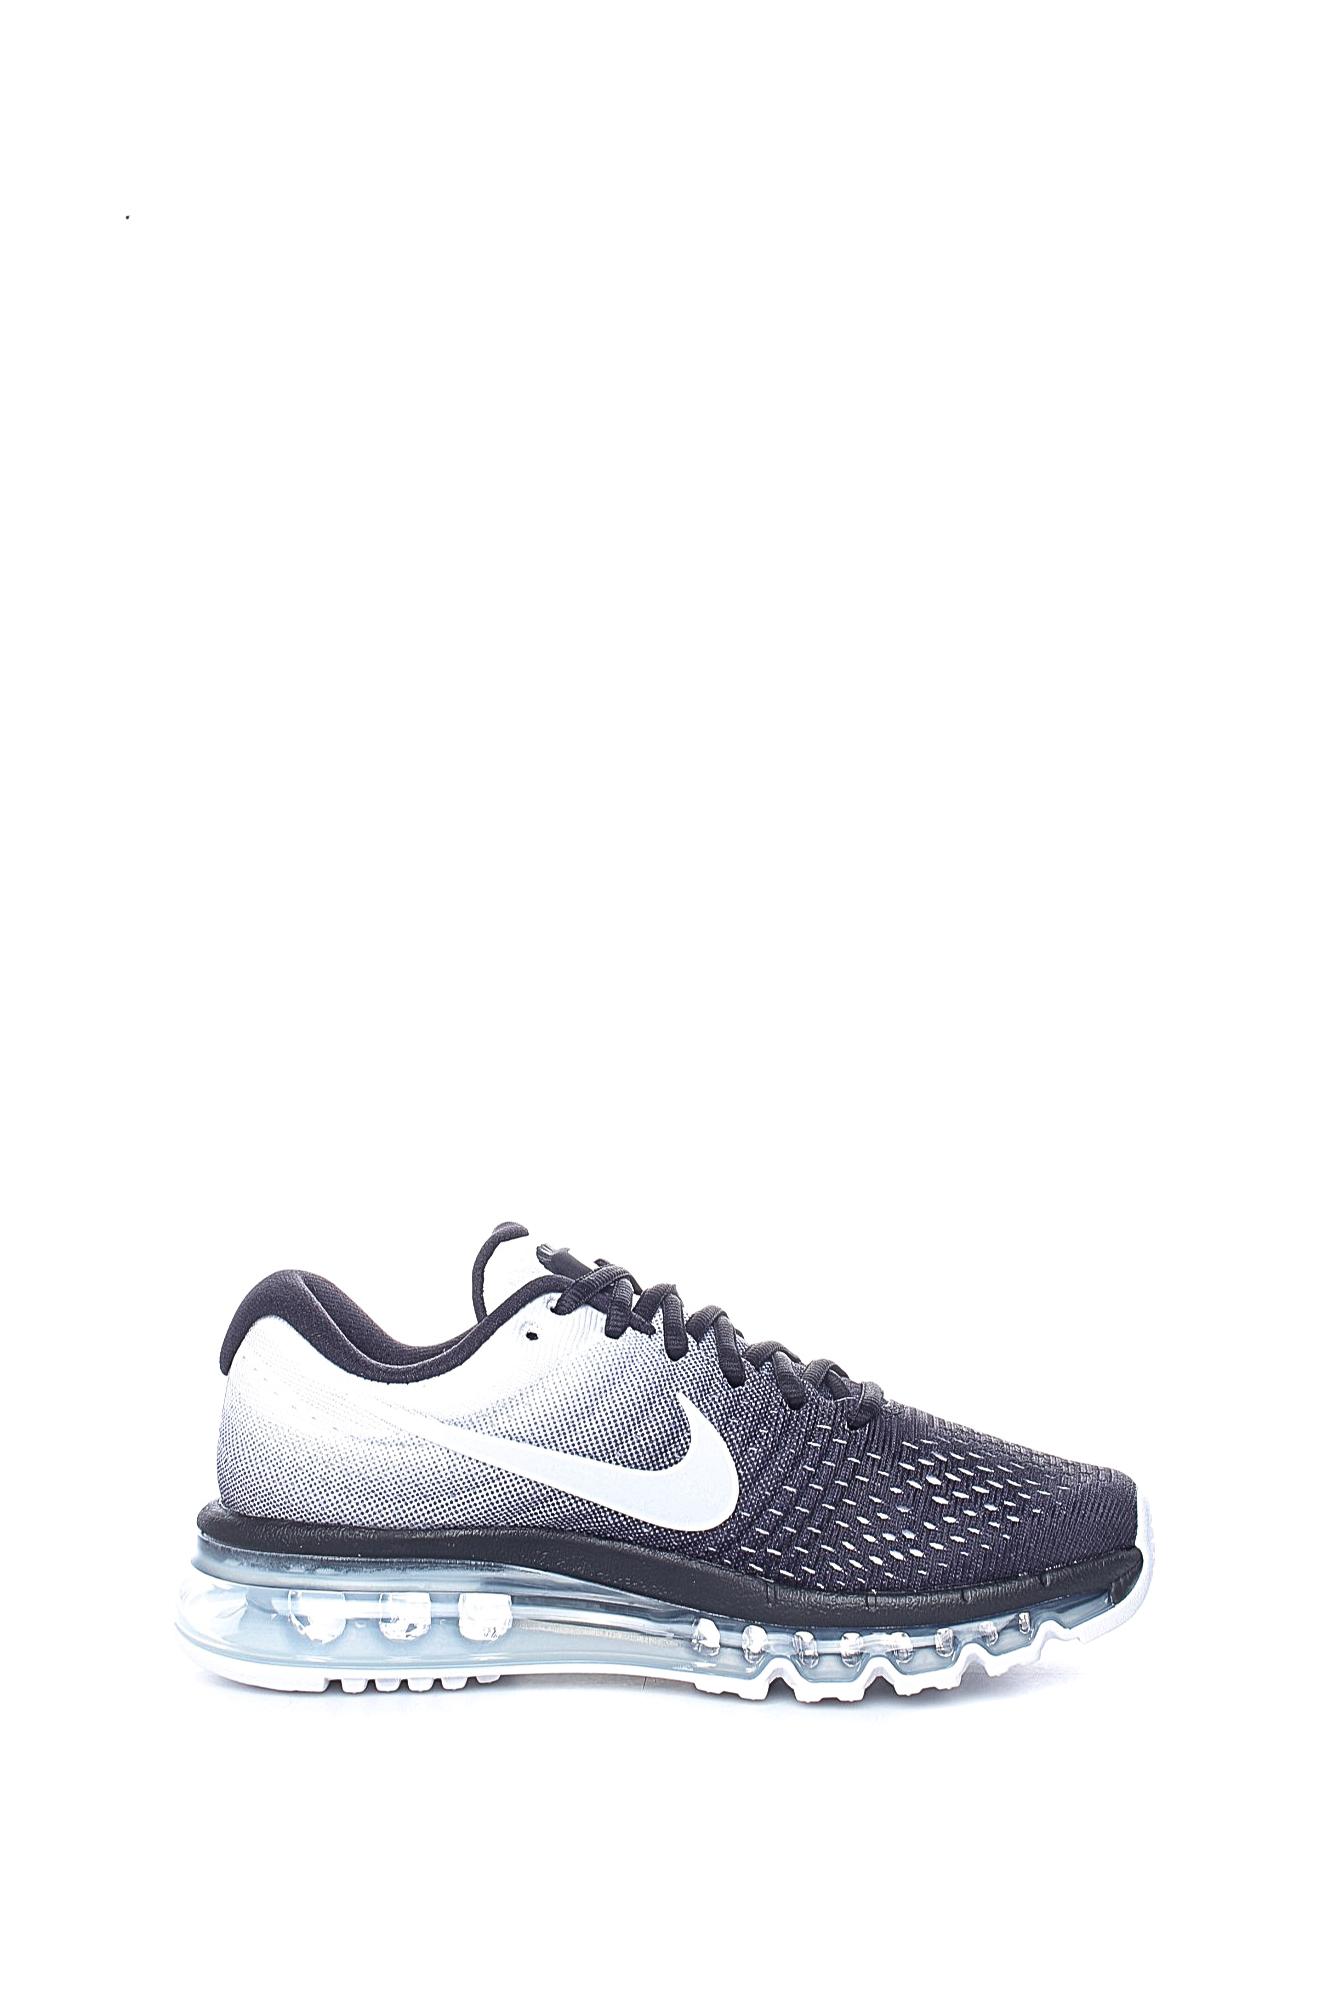 NIKE - Γυναικεία παπούτσια για τρέξιμο Nike AIR MAX 2017 μαύρα - λευκά γυναικεία παπούτσια αθλητικά running